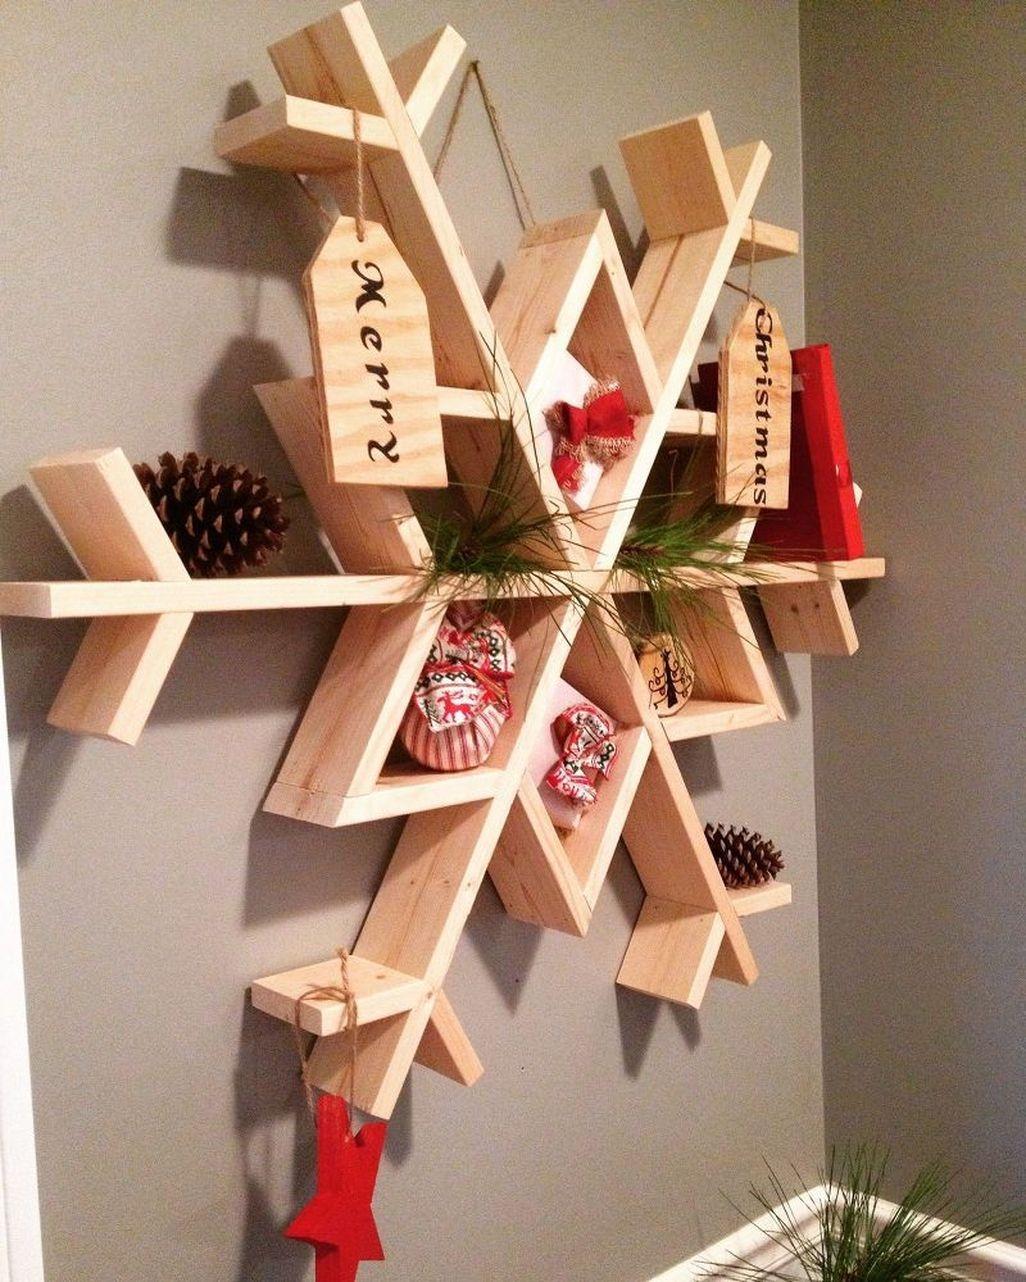 Creative Diy Wooden Home Decorations Ideas 15